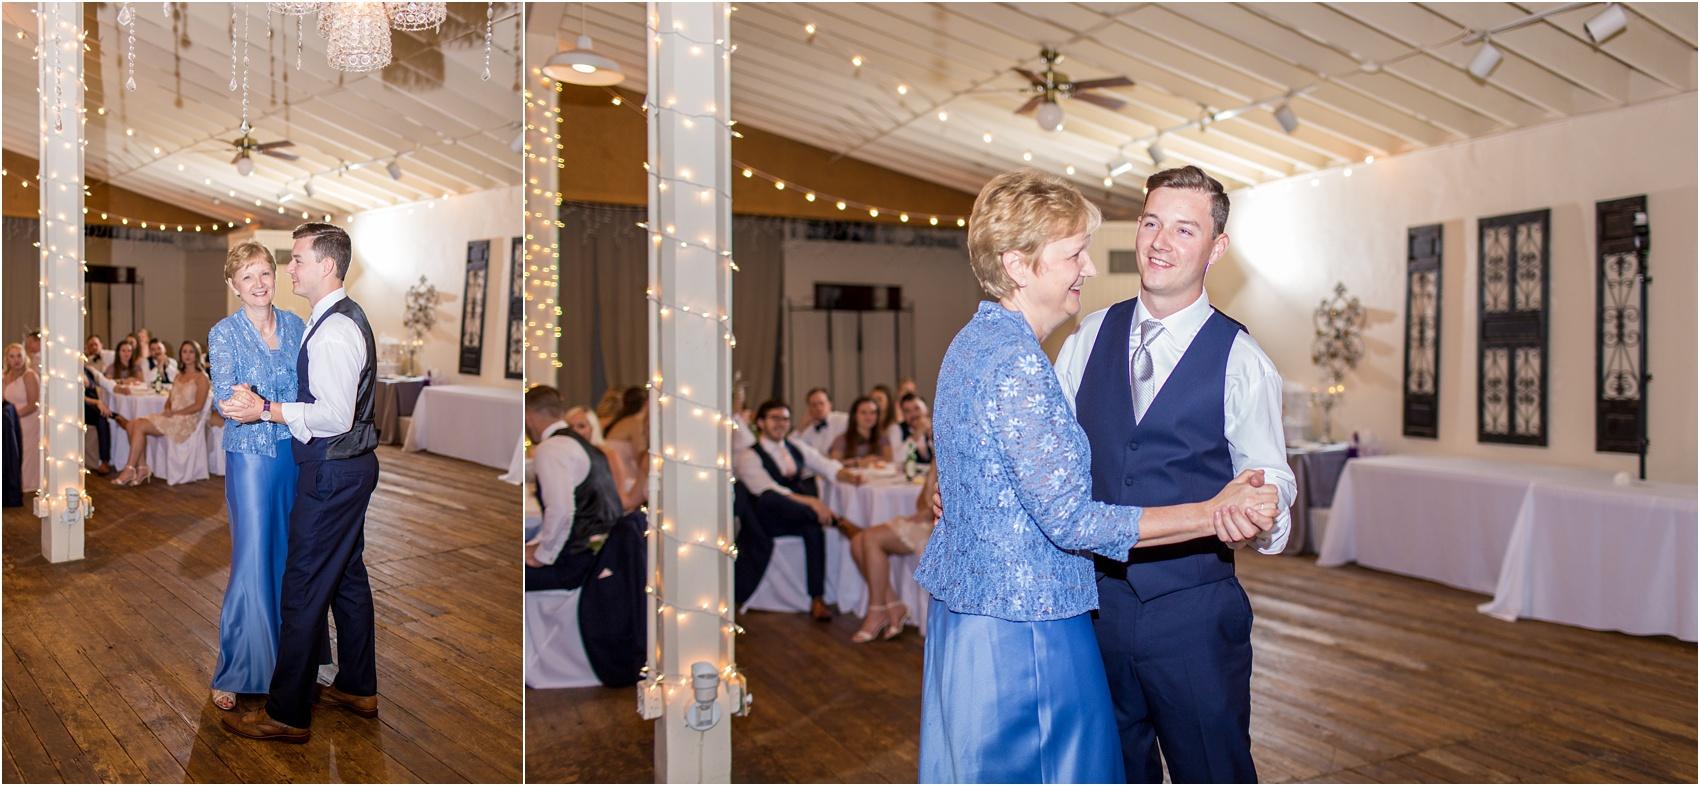 Savannah Eve Photography- Roper-Powell Wedding- Blog-65.jpg